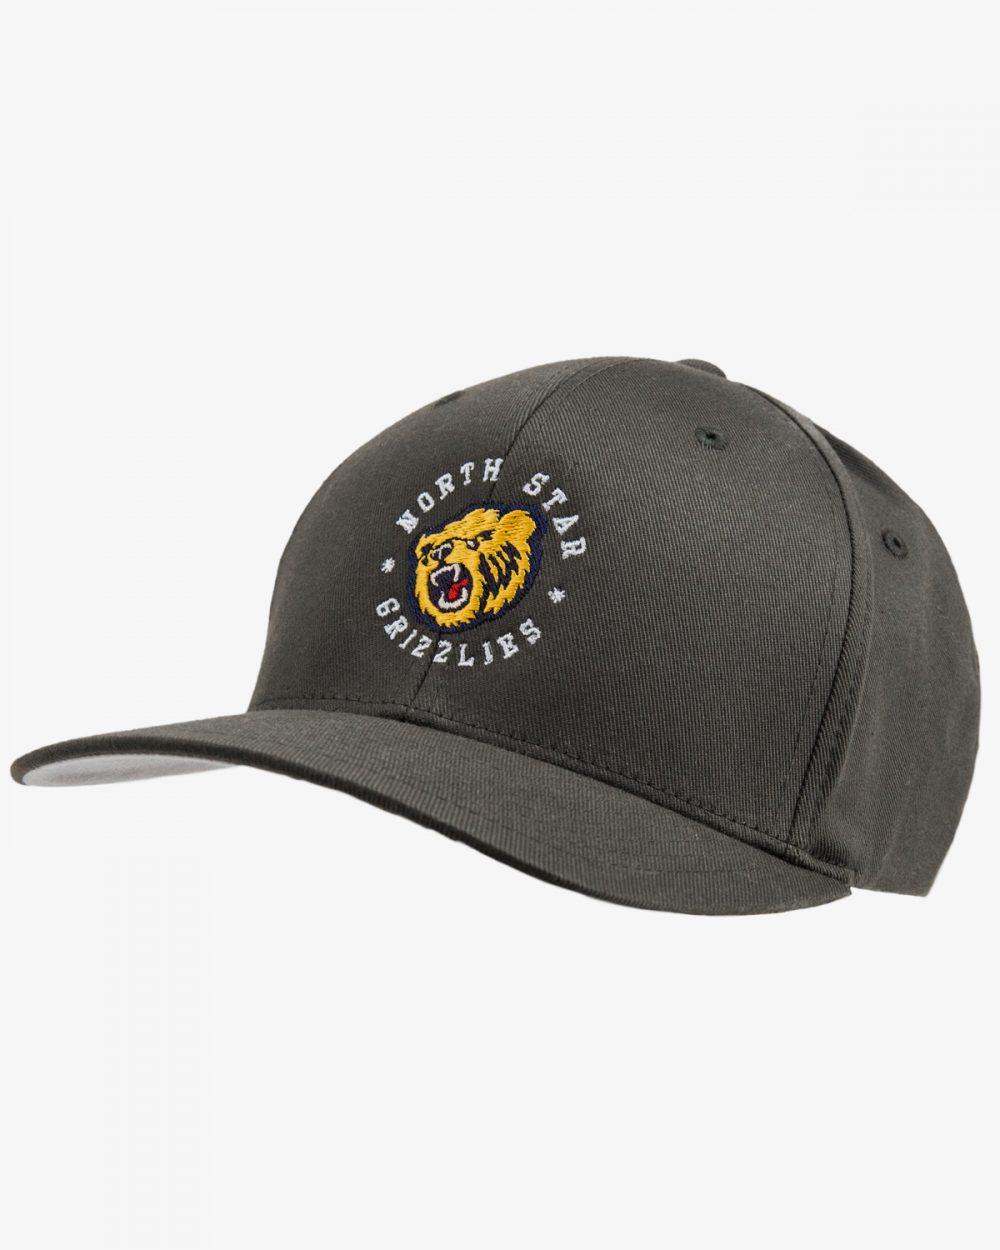 Performance Baseball Hat 521 Grey